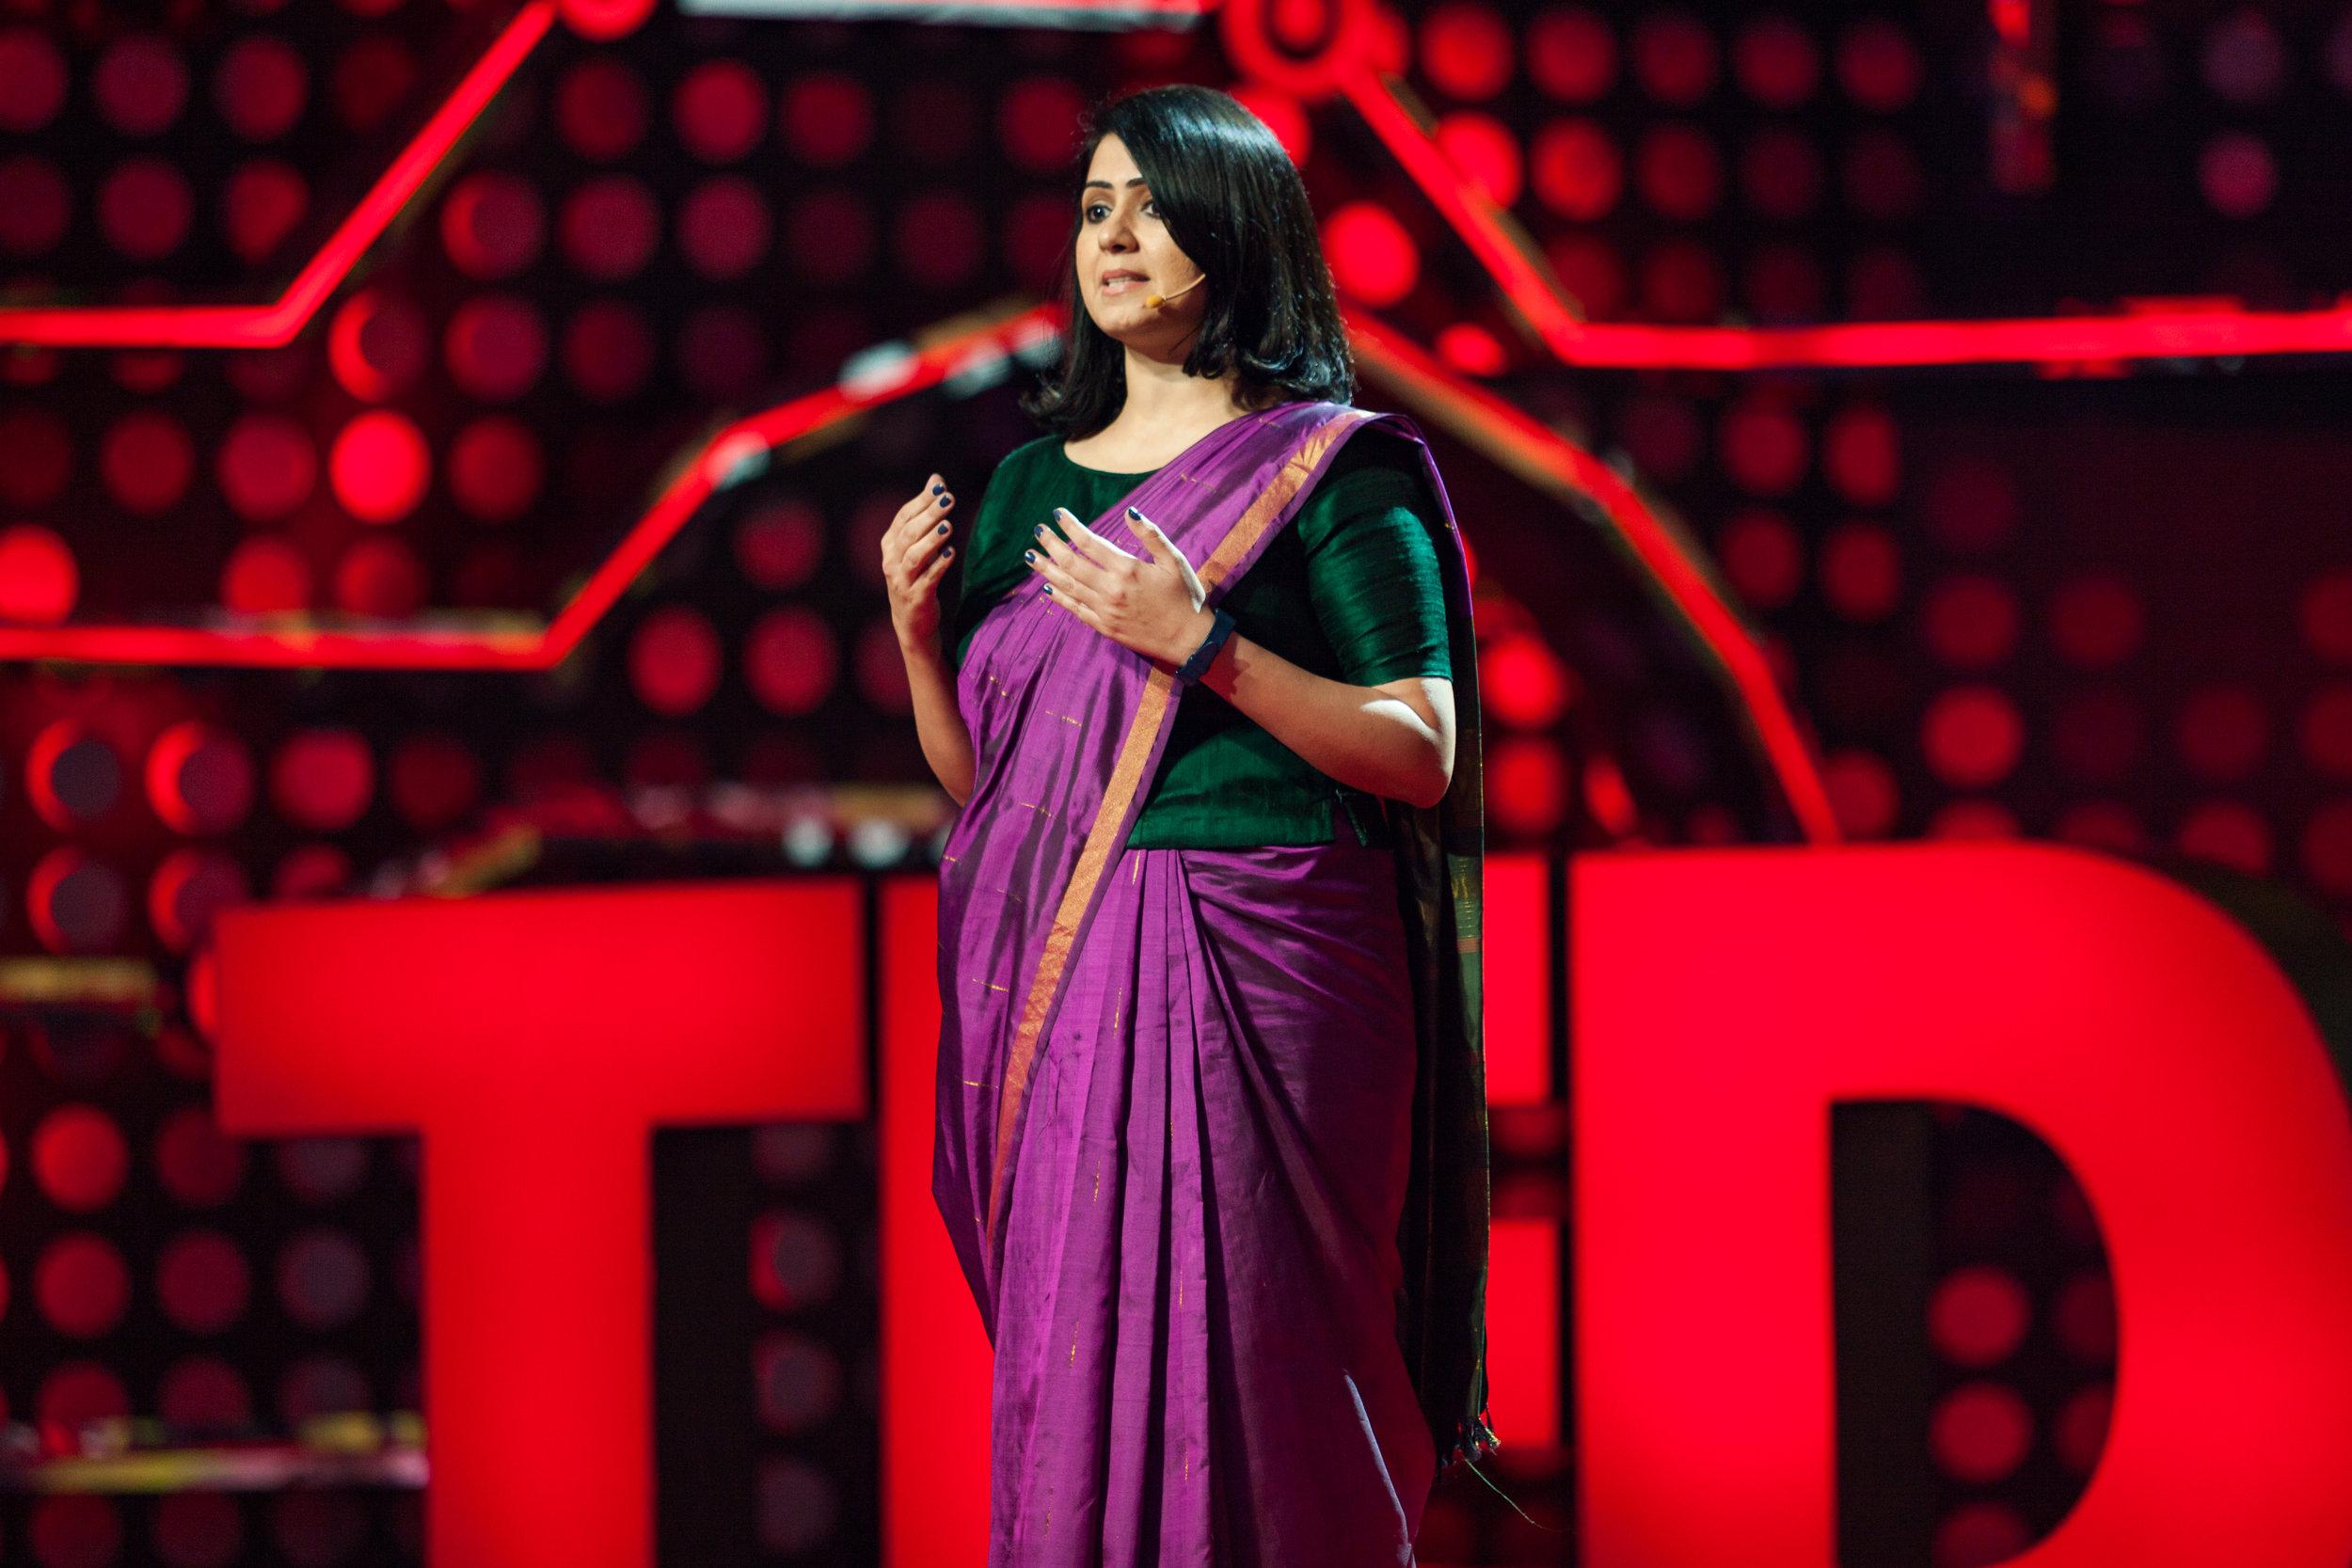 TEDTalks_India_20170822_AM3224.jpg